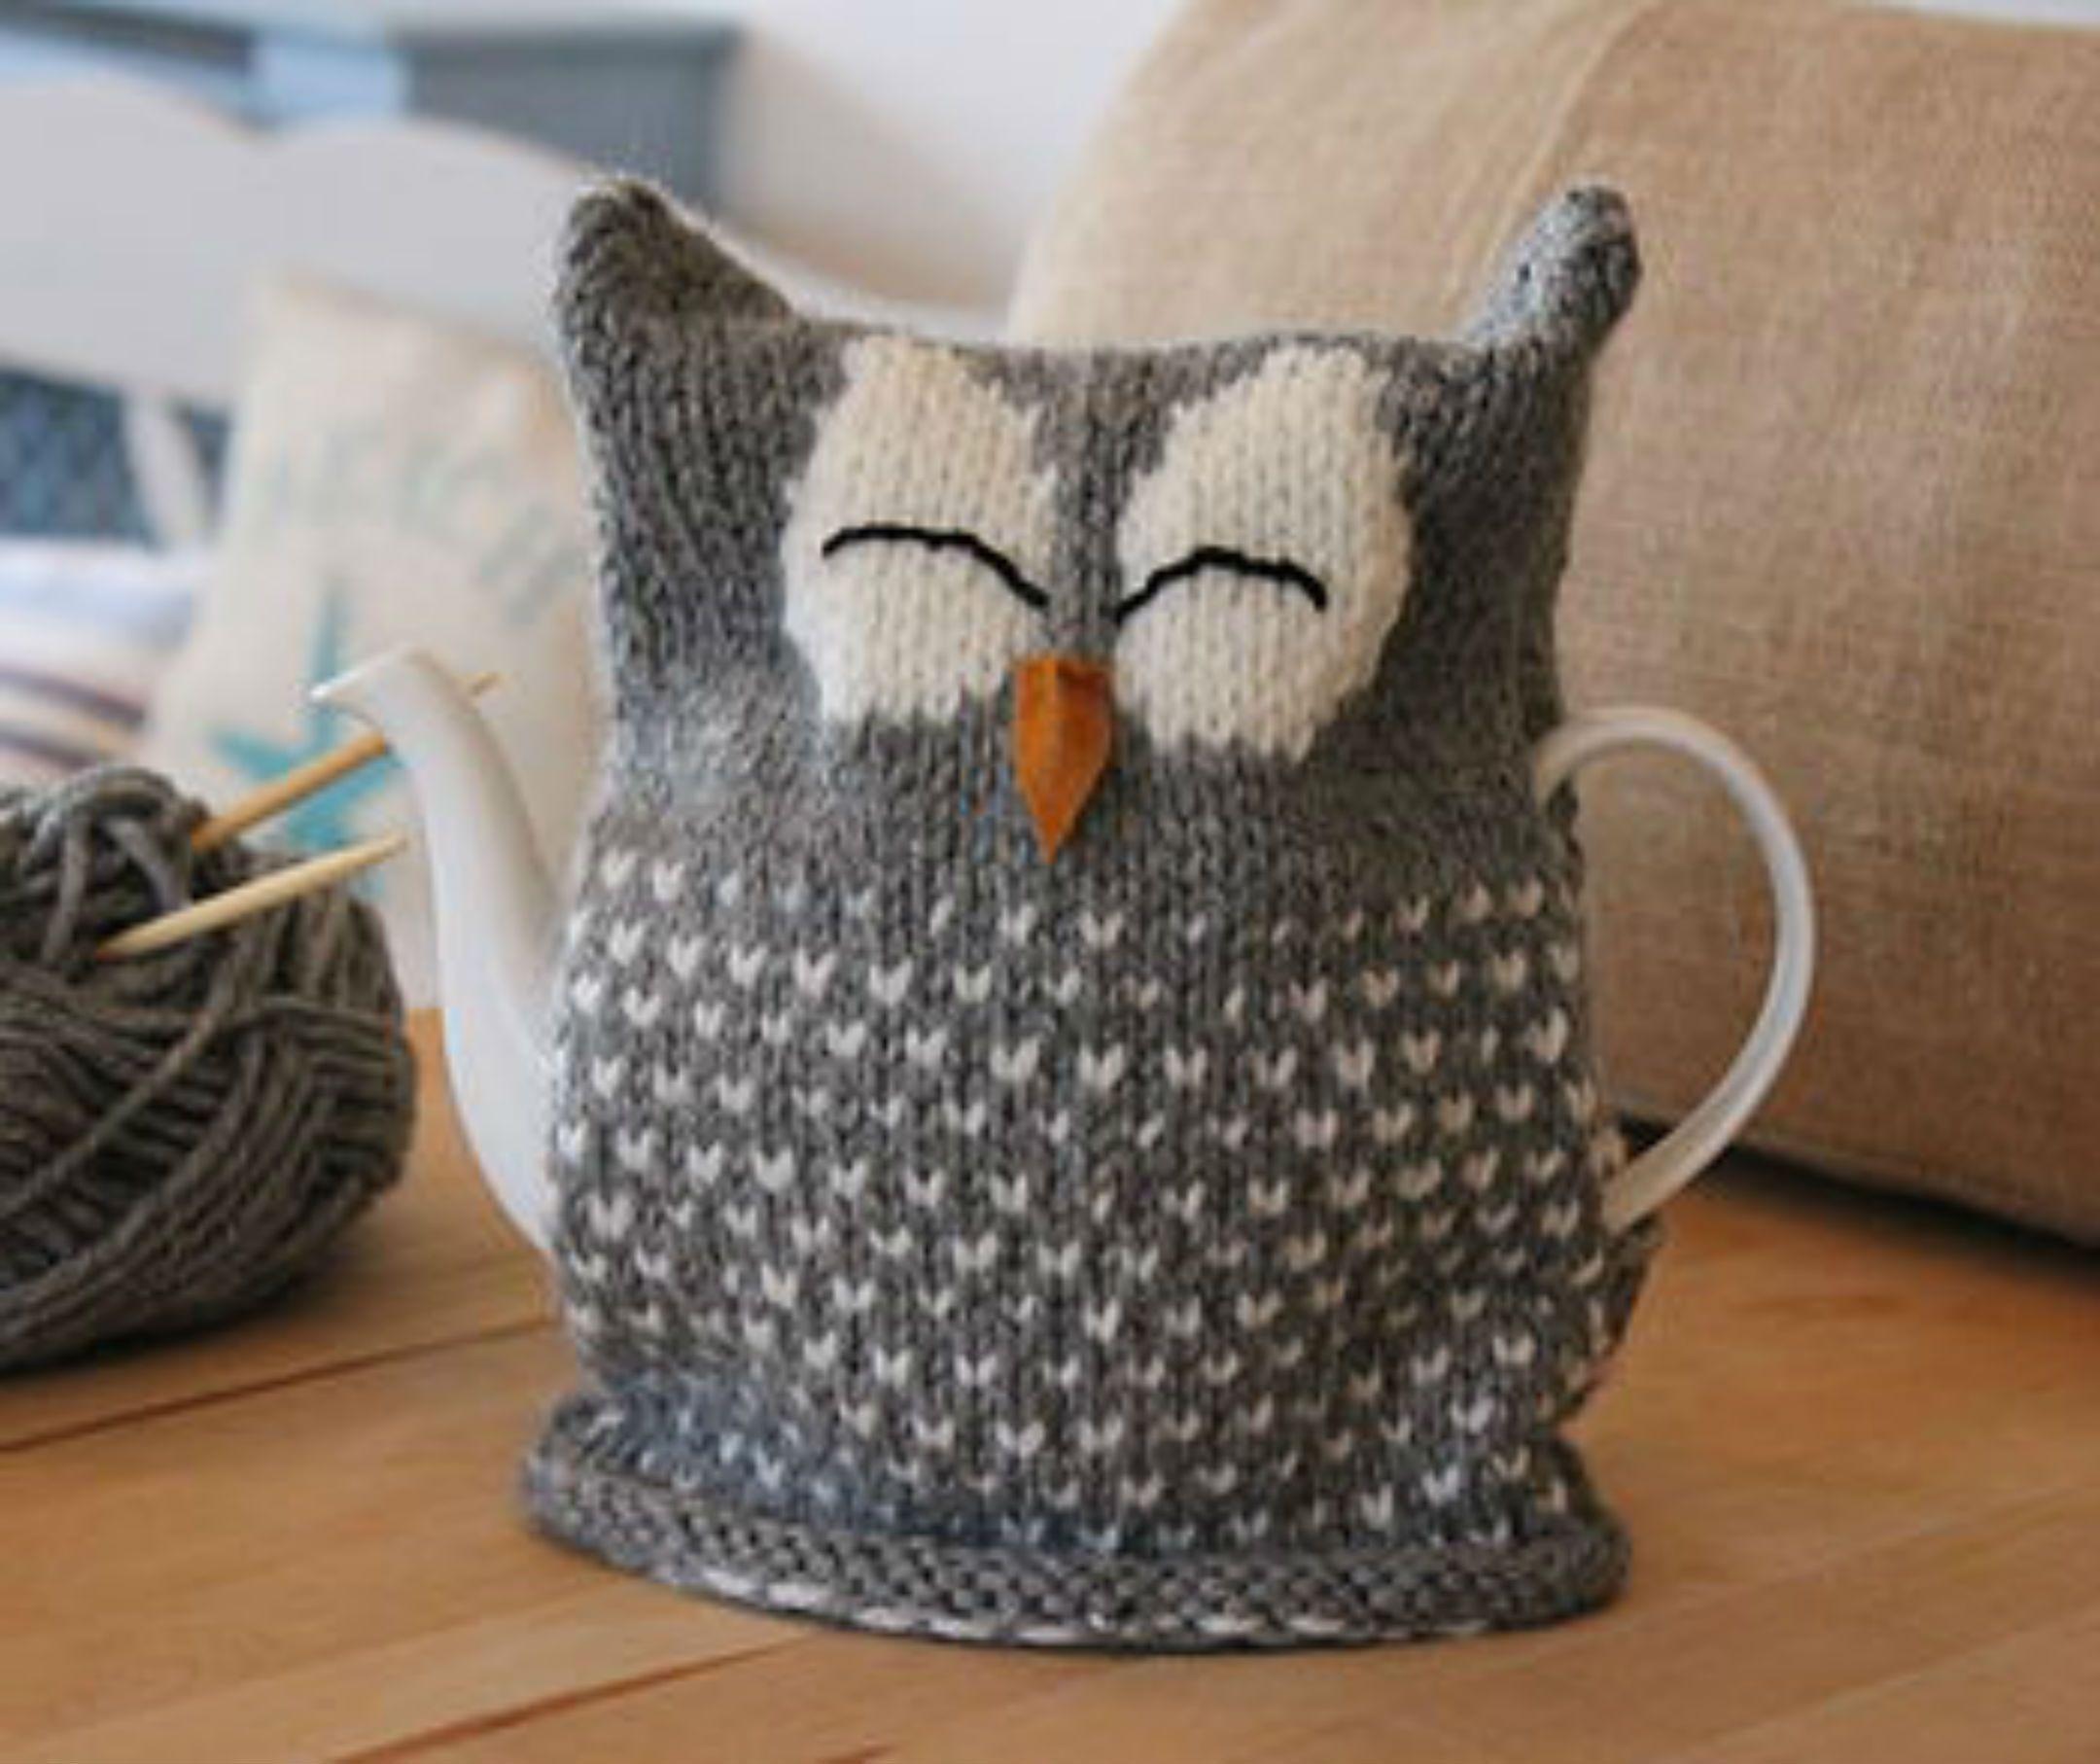 Cute owl tea cosy shared on the LoveKnitting Community.